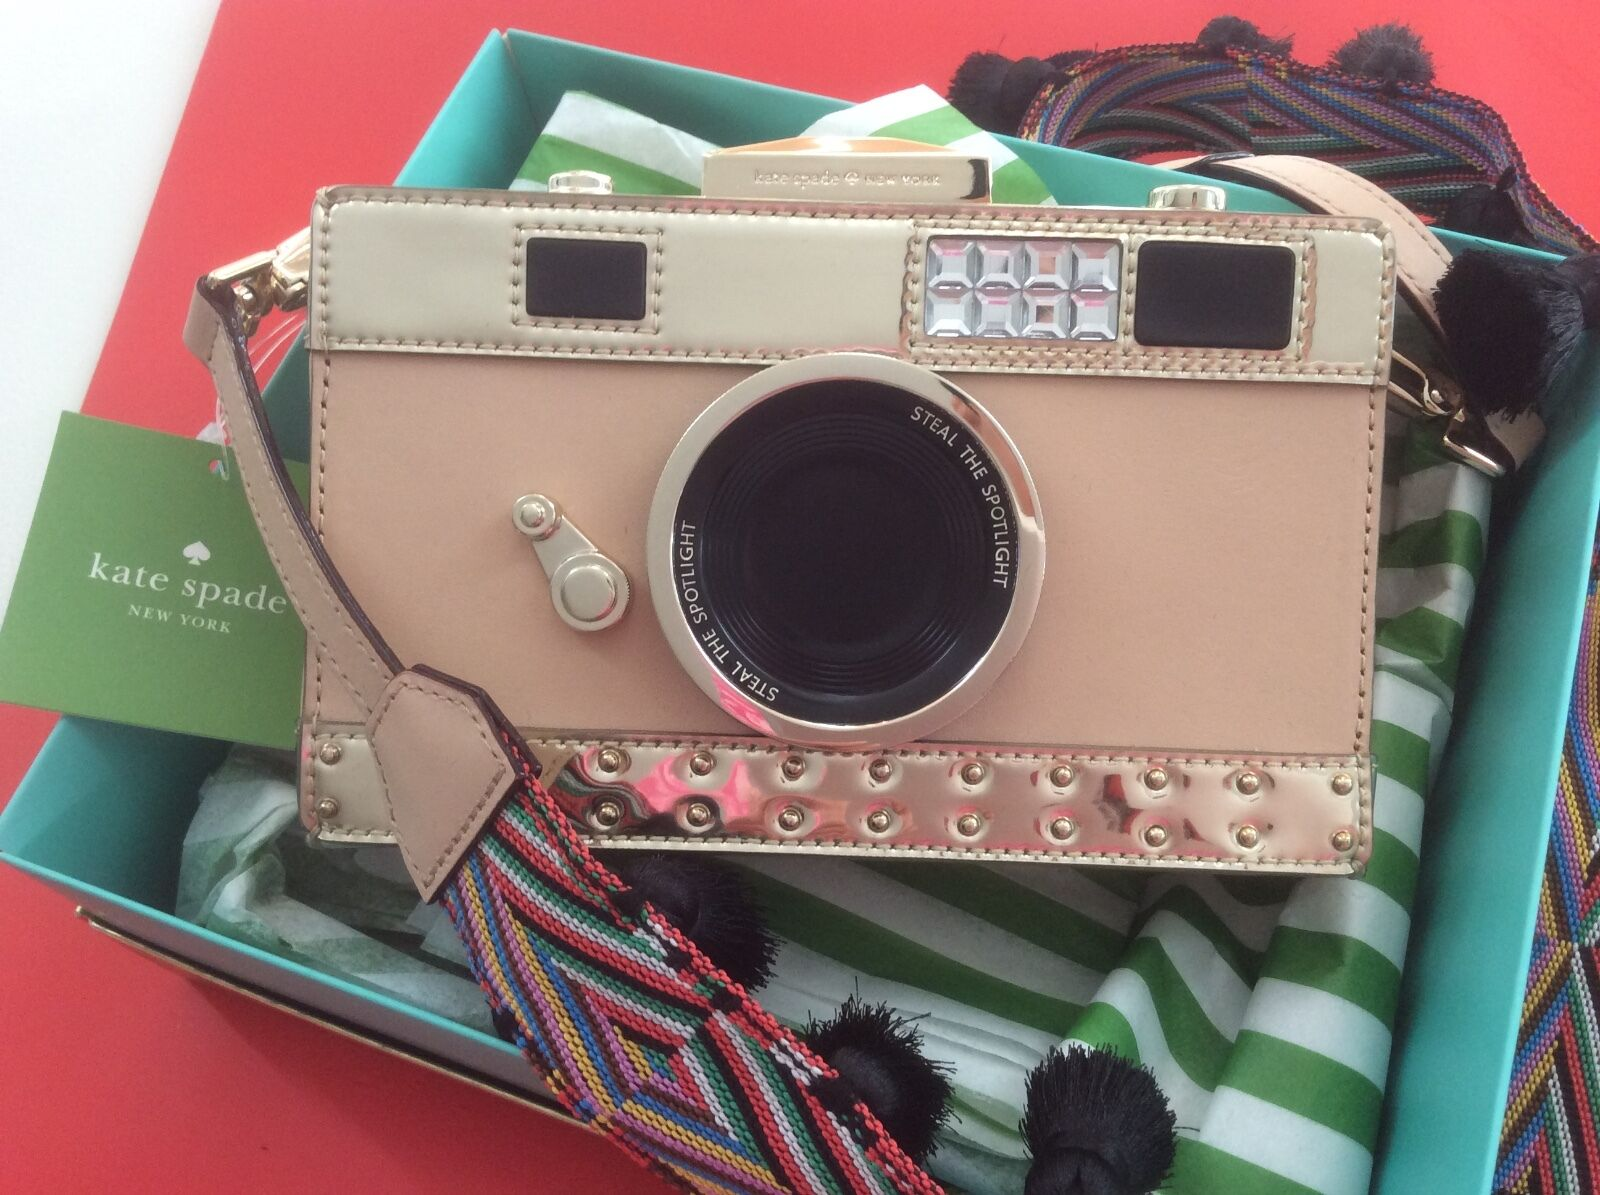 Nwt Kate Spade E Things Up Camera Bag Crossbody Clutch In Original Packaging